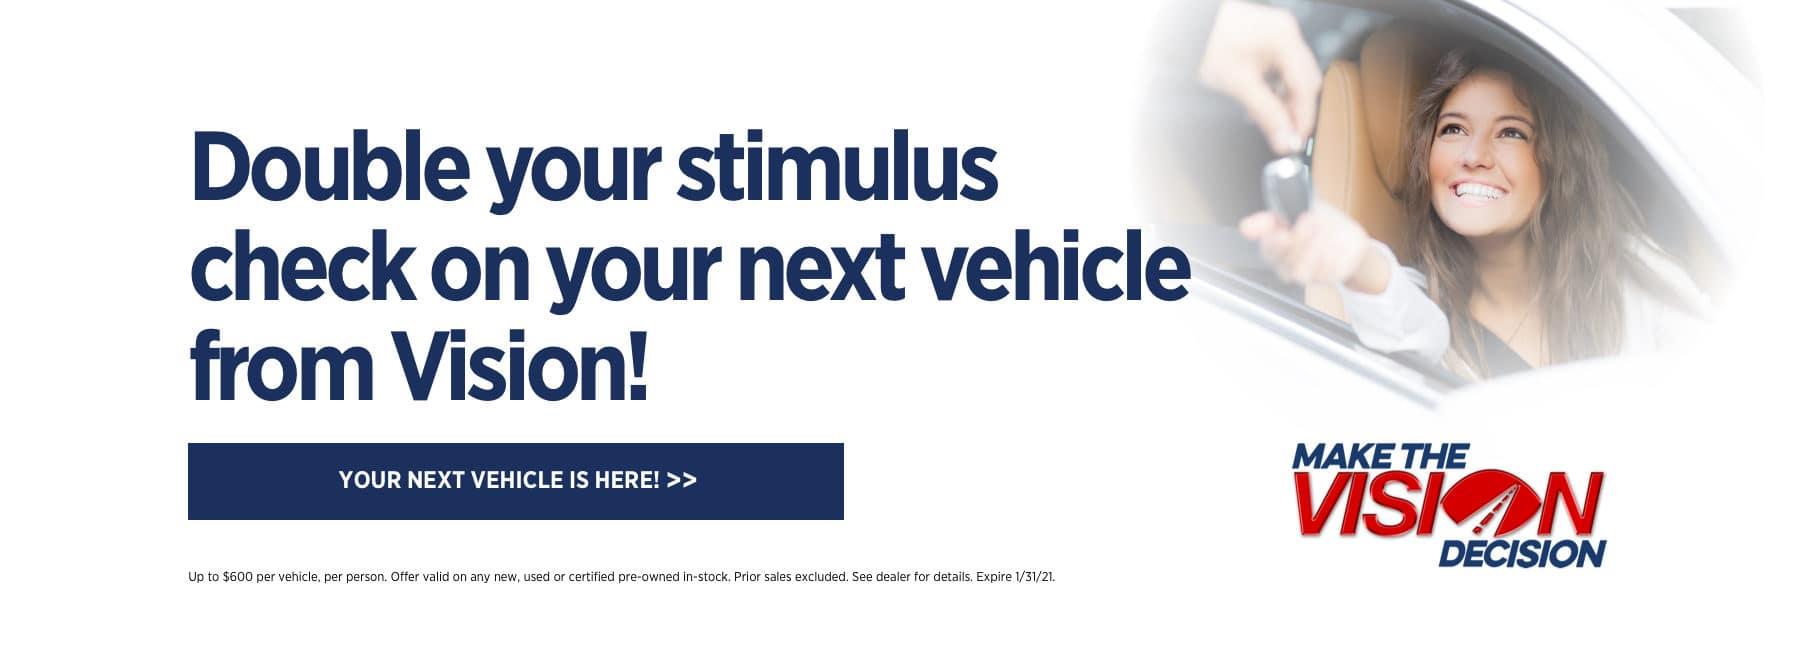 Vision-Nissan-Sliders-0106-Stim-Check2